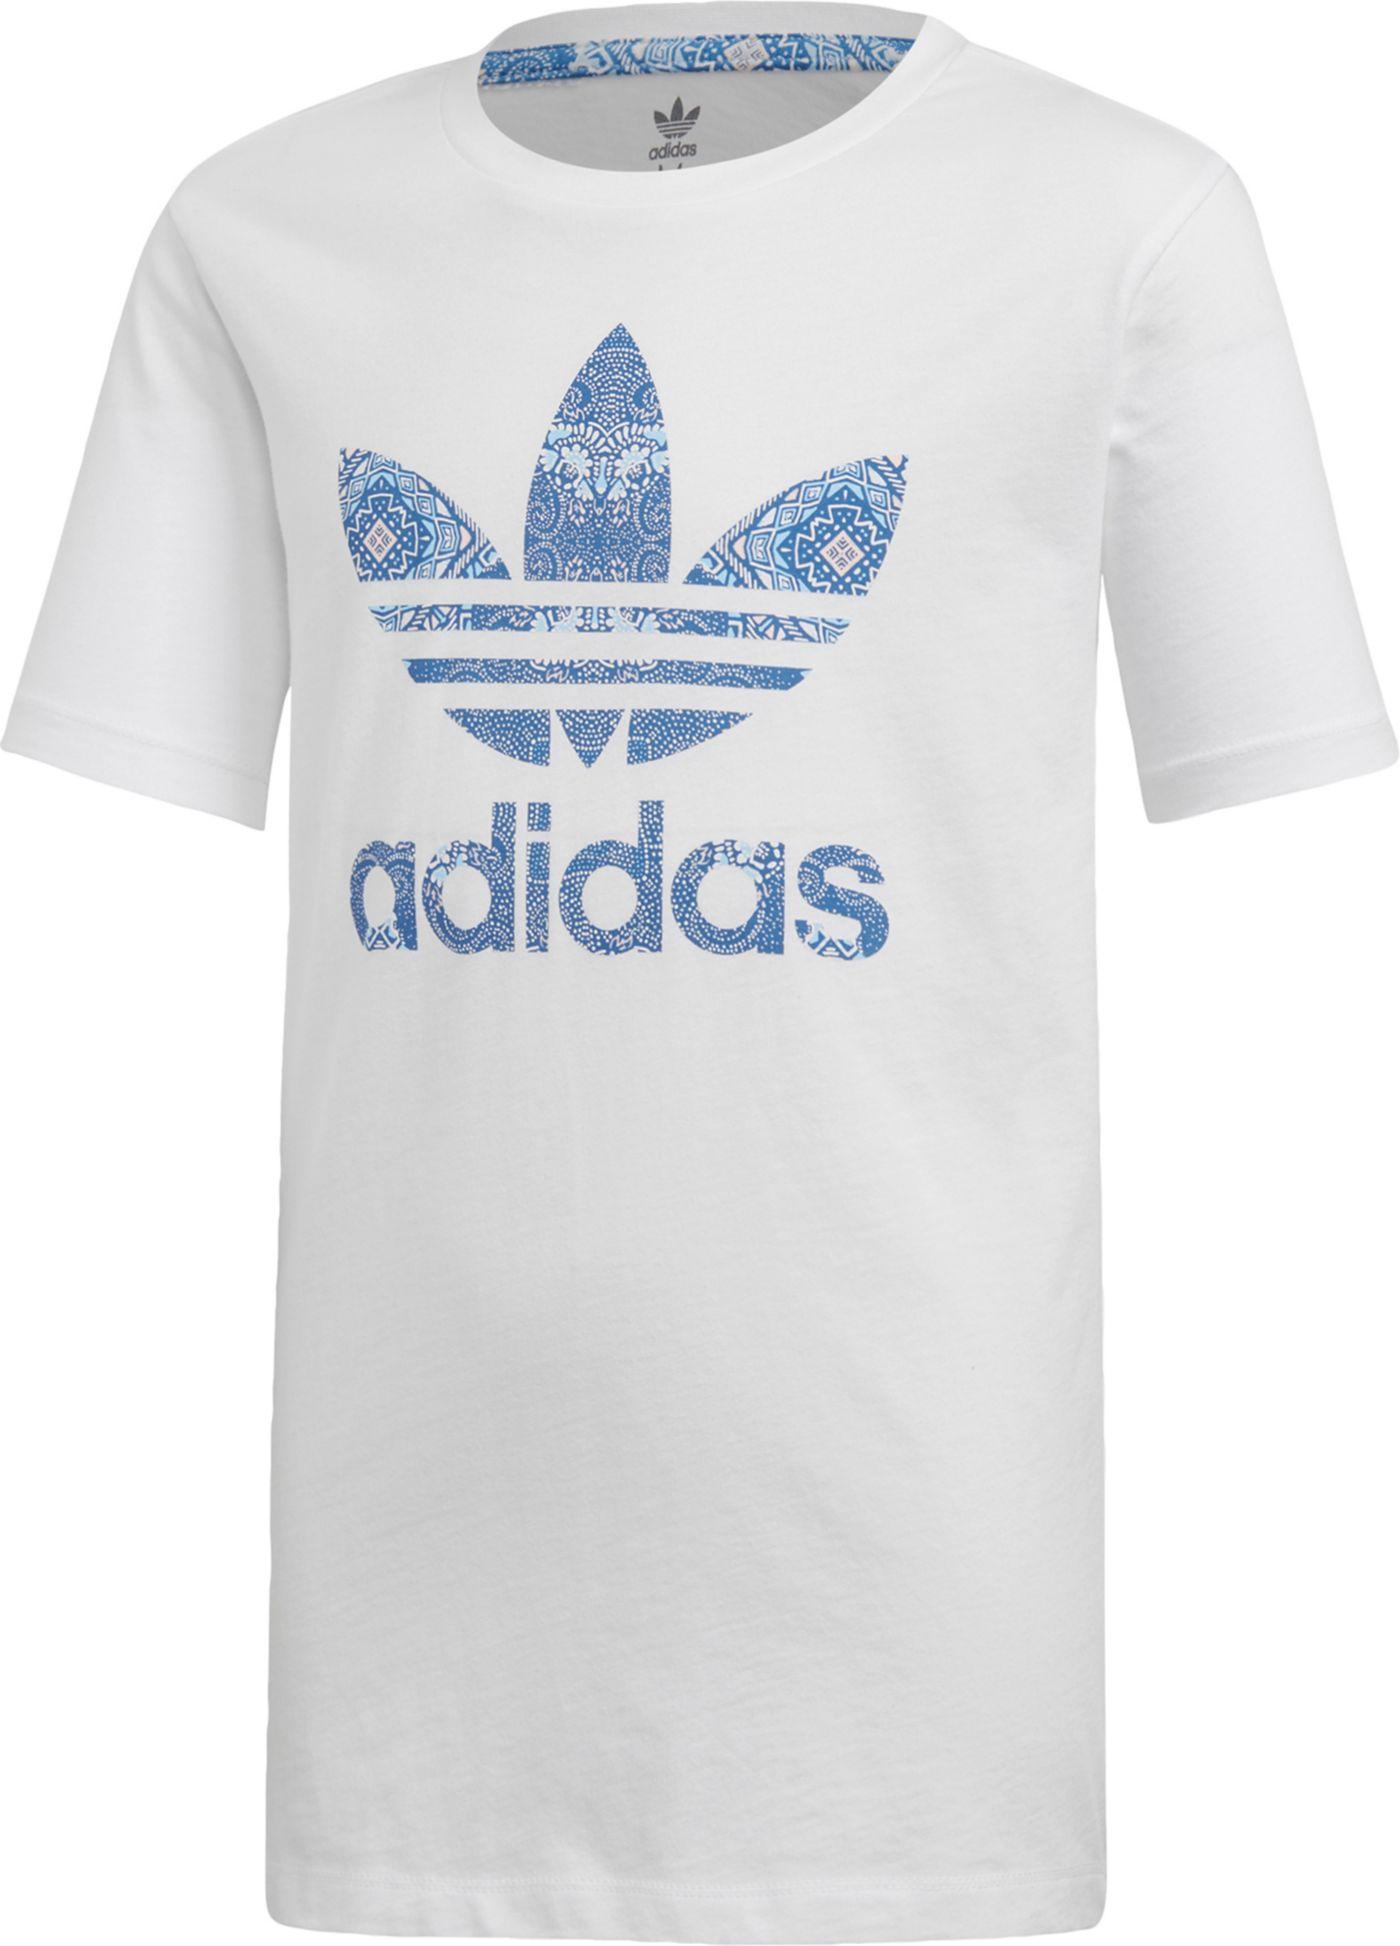 adidas Originals Girls' Culture Crash Trefoil Graphic T-Shirt